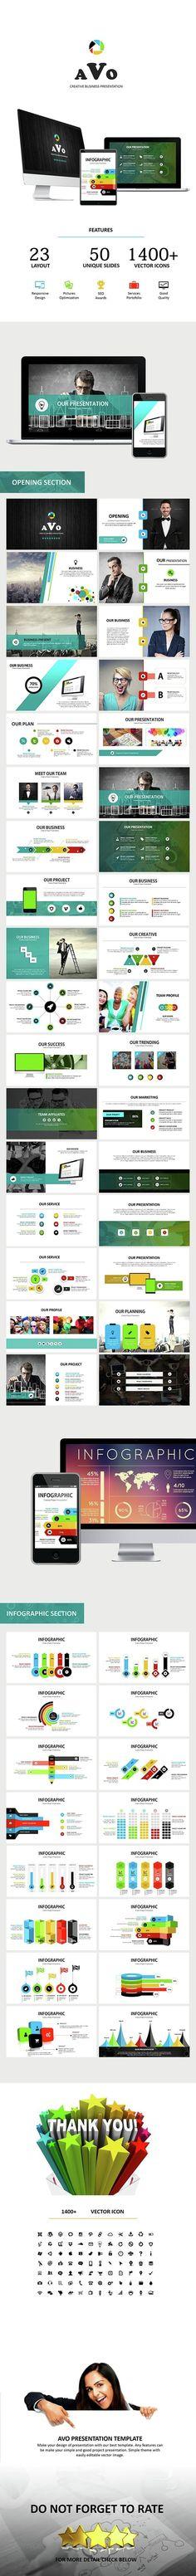 COLORS - Powerpoint Business Presentation Business presentation - business presentation